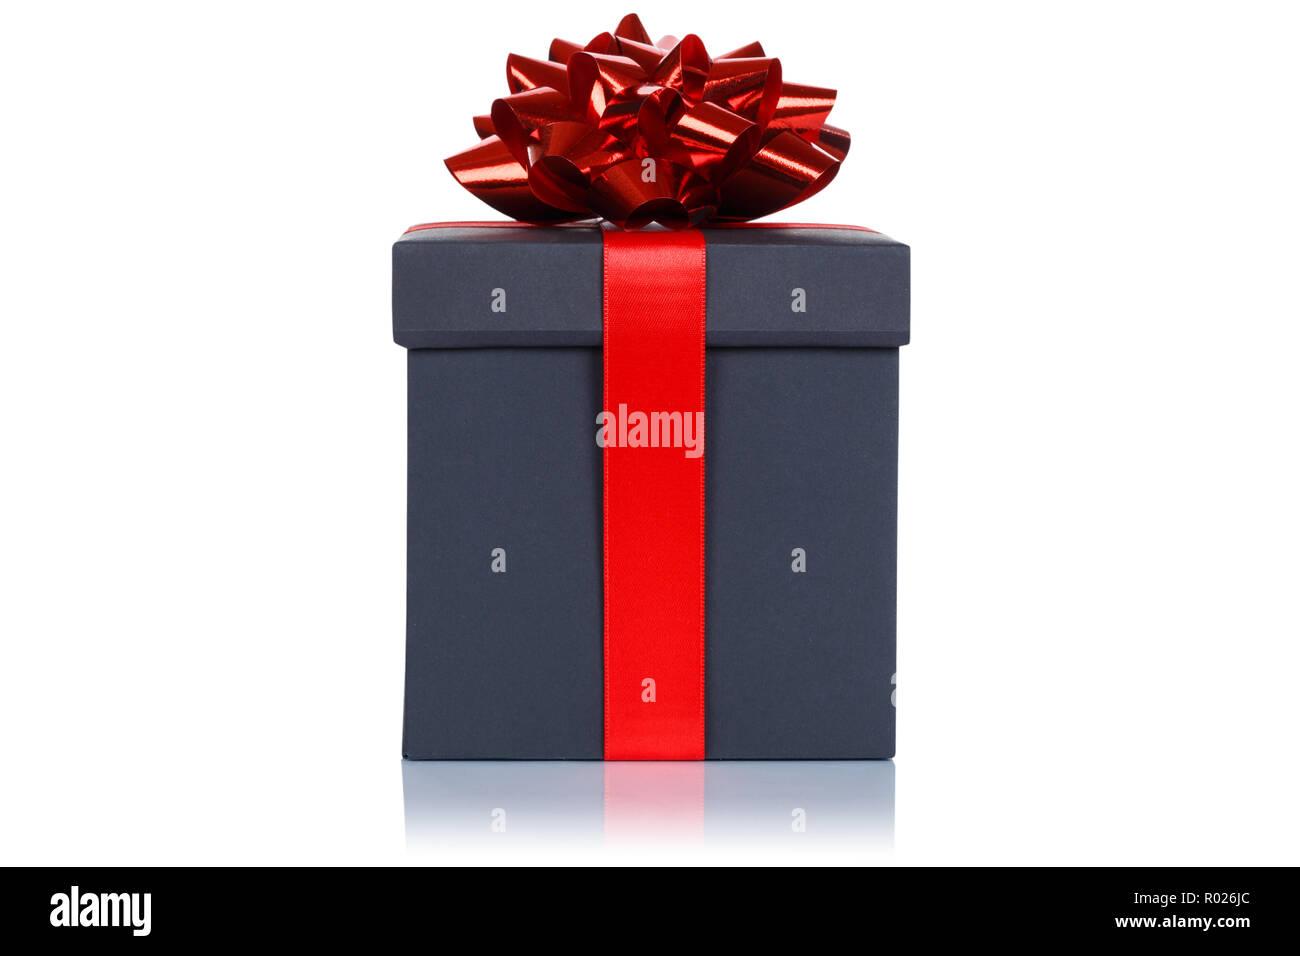 Christmas birthday gift present wedding black box isolated on a white background - Stock Image